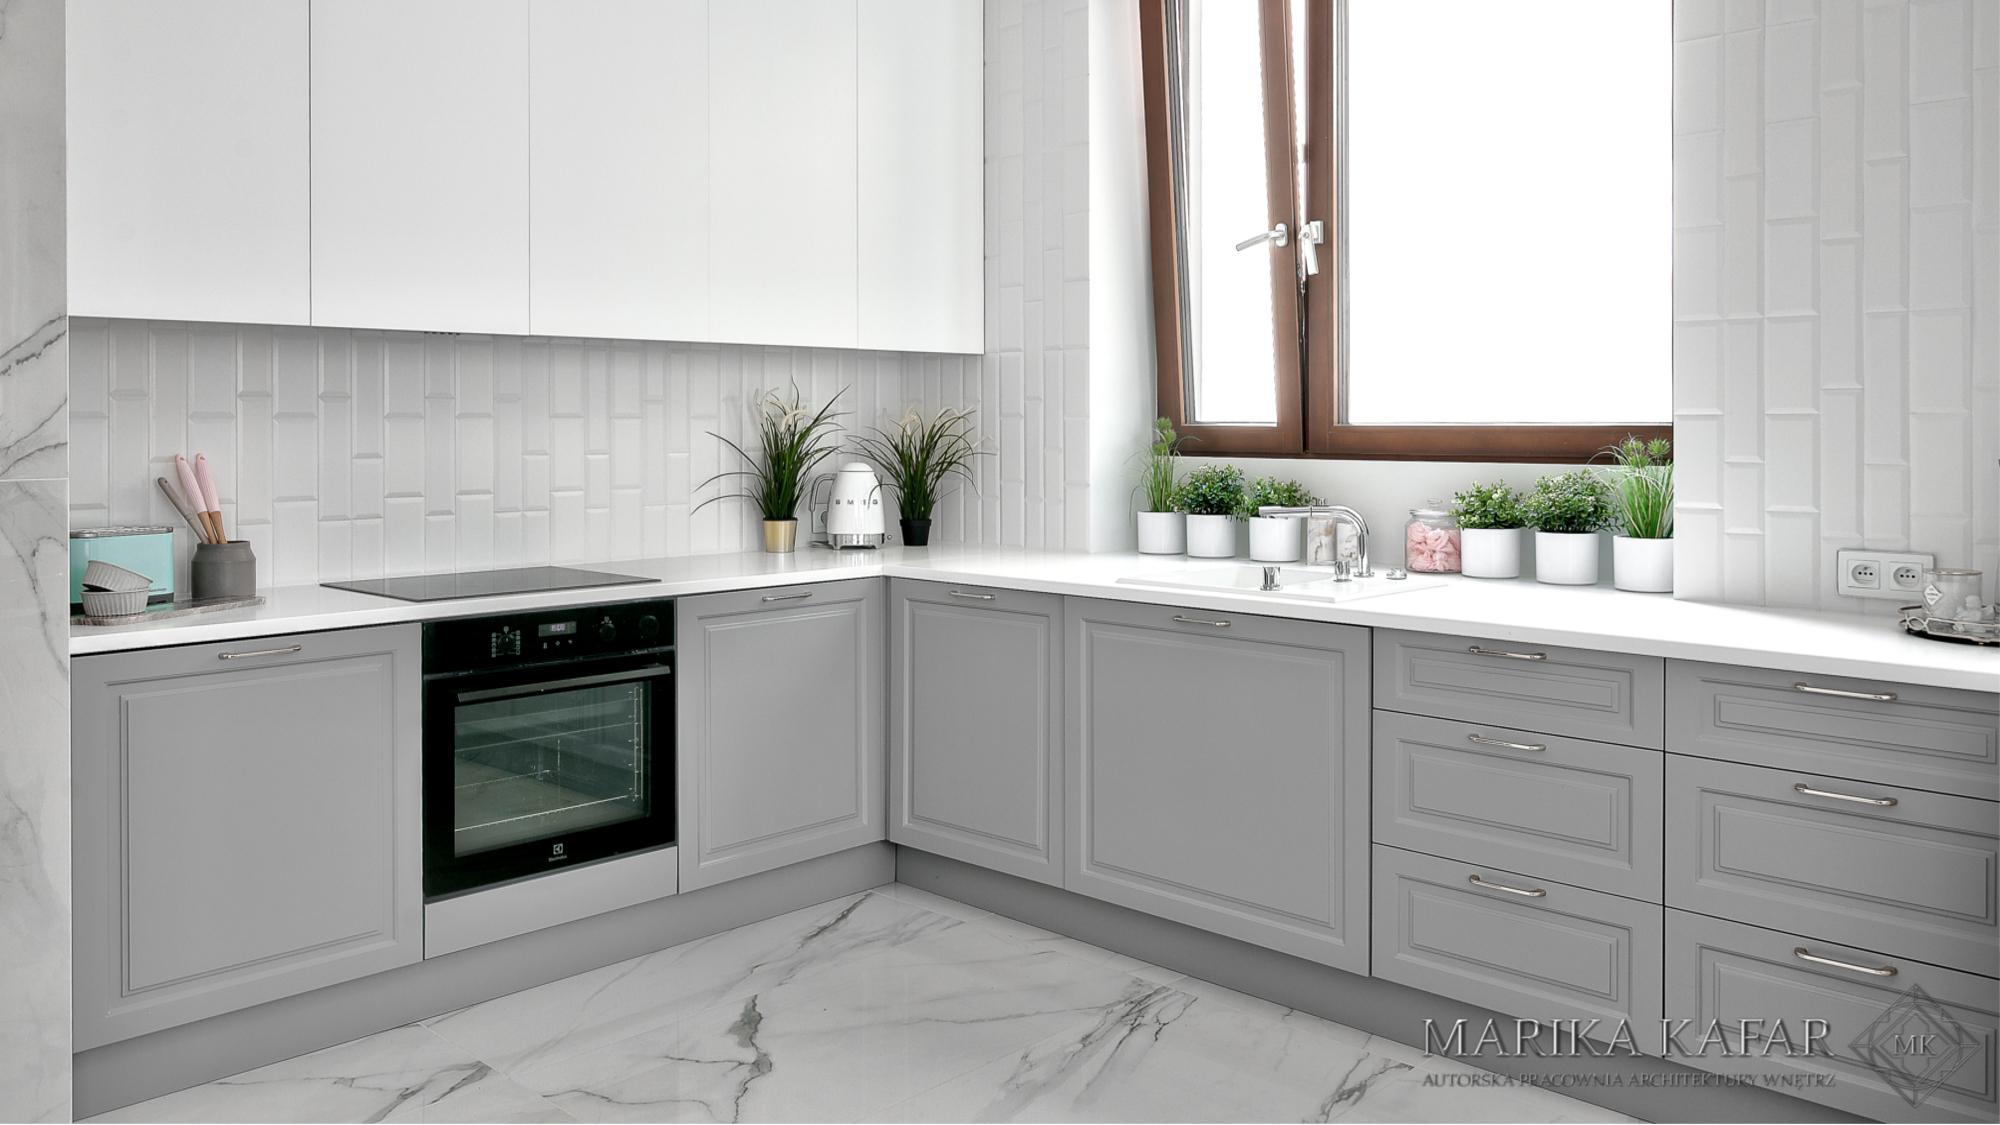 Marika Kafar. Biała kuchnia z marmurkiem na podłodze.